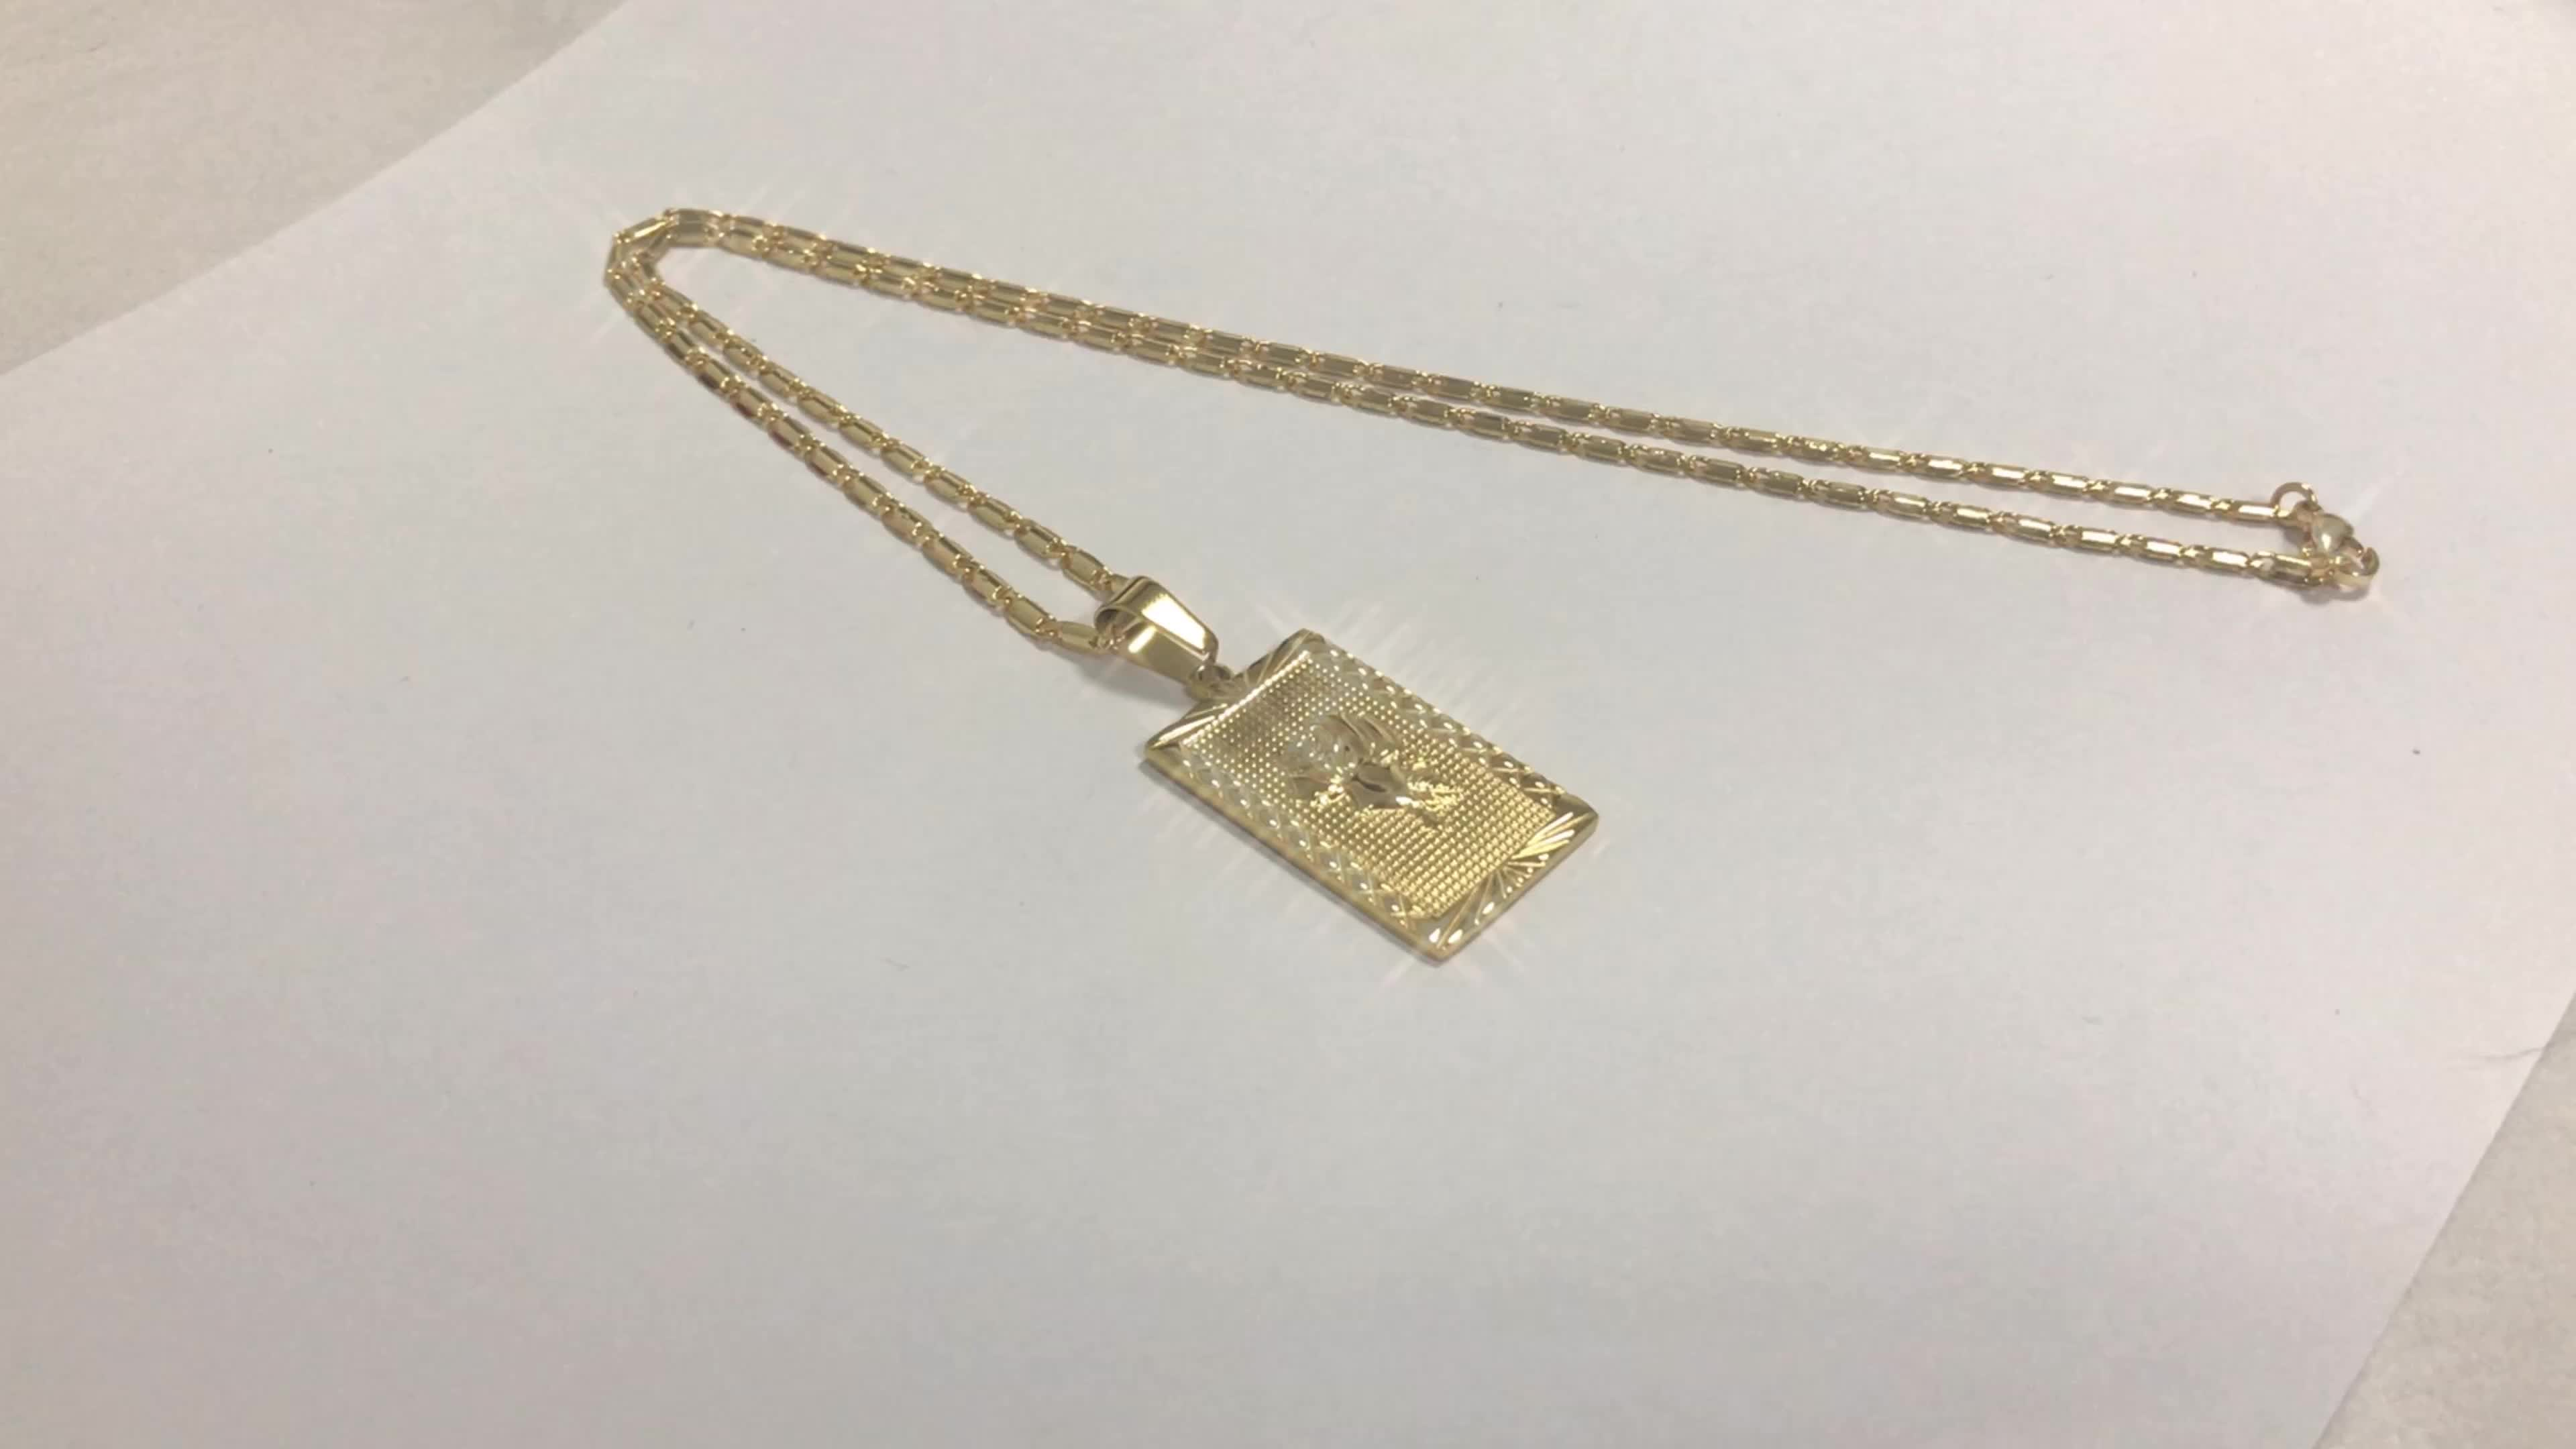 Everly Rose Pendant Necklace, Plain Gold Necklace